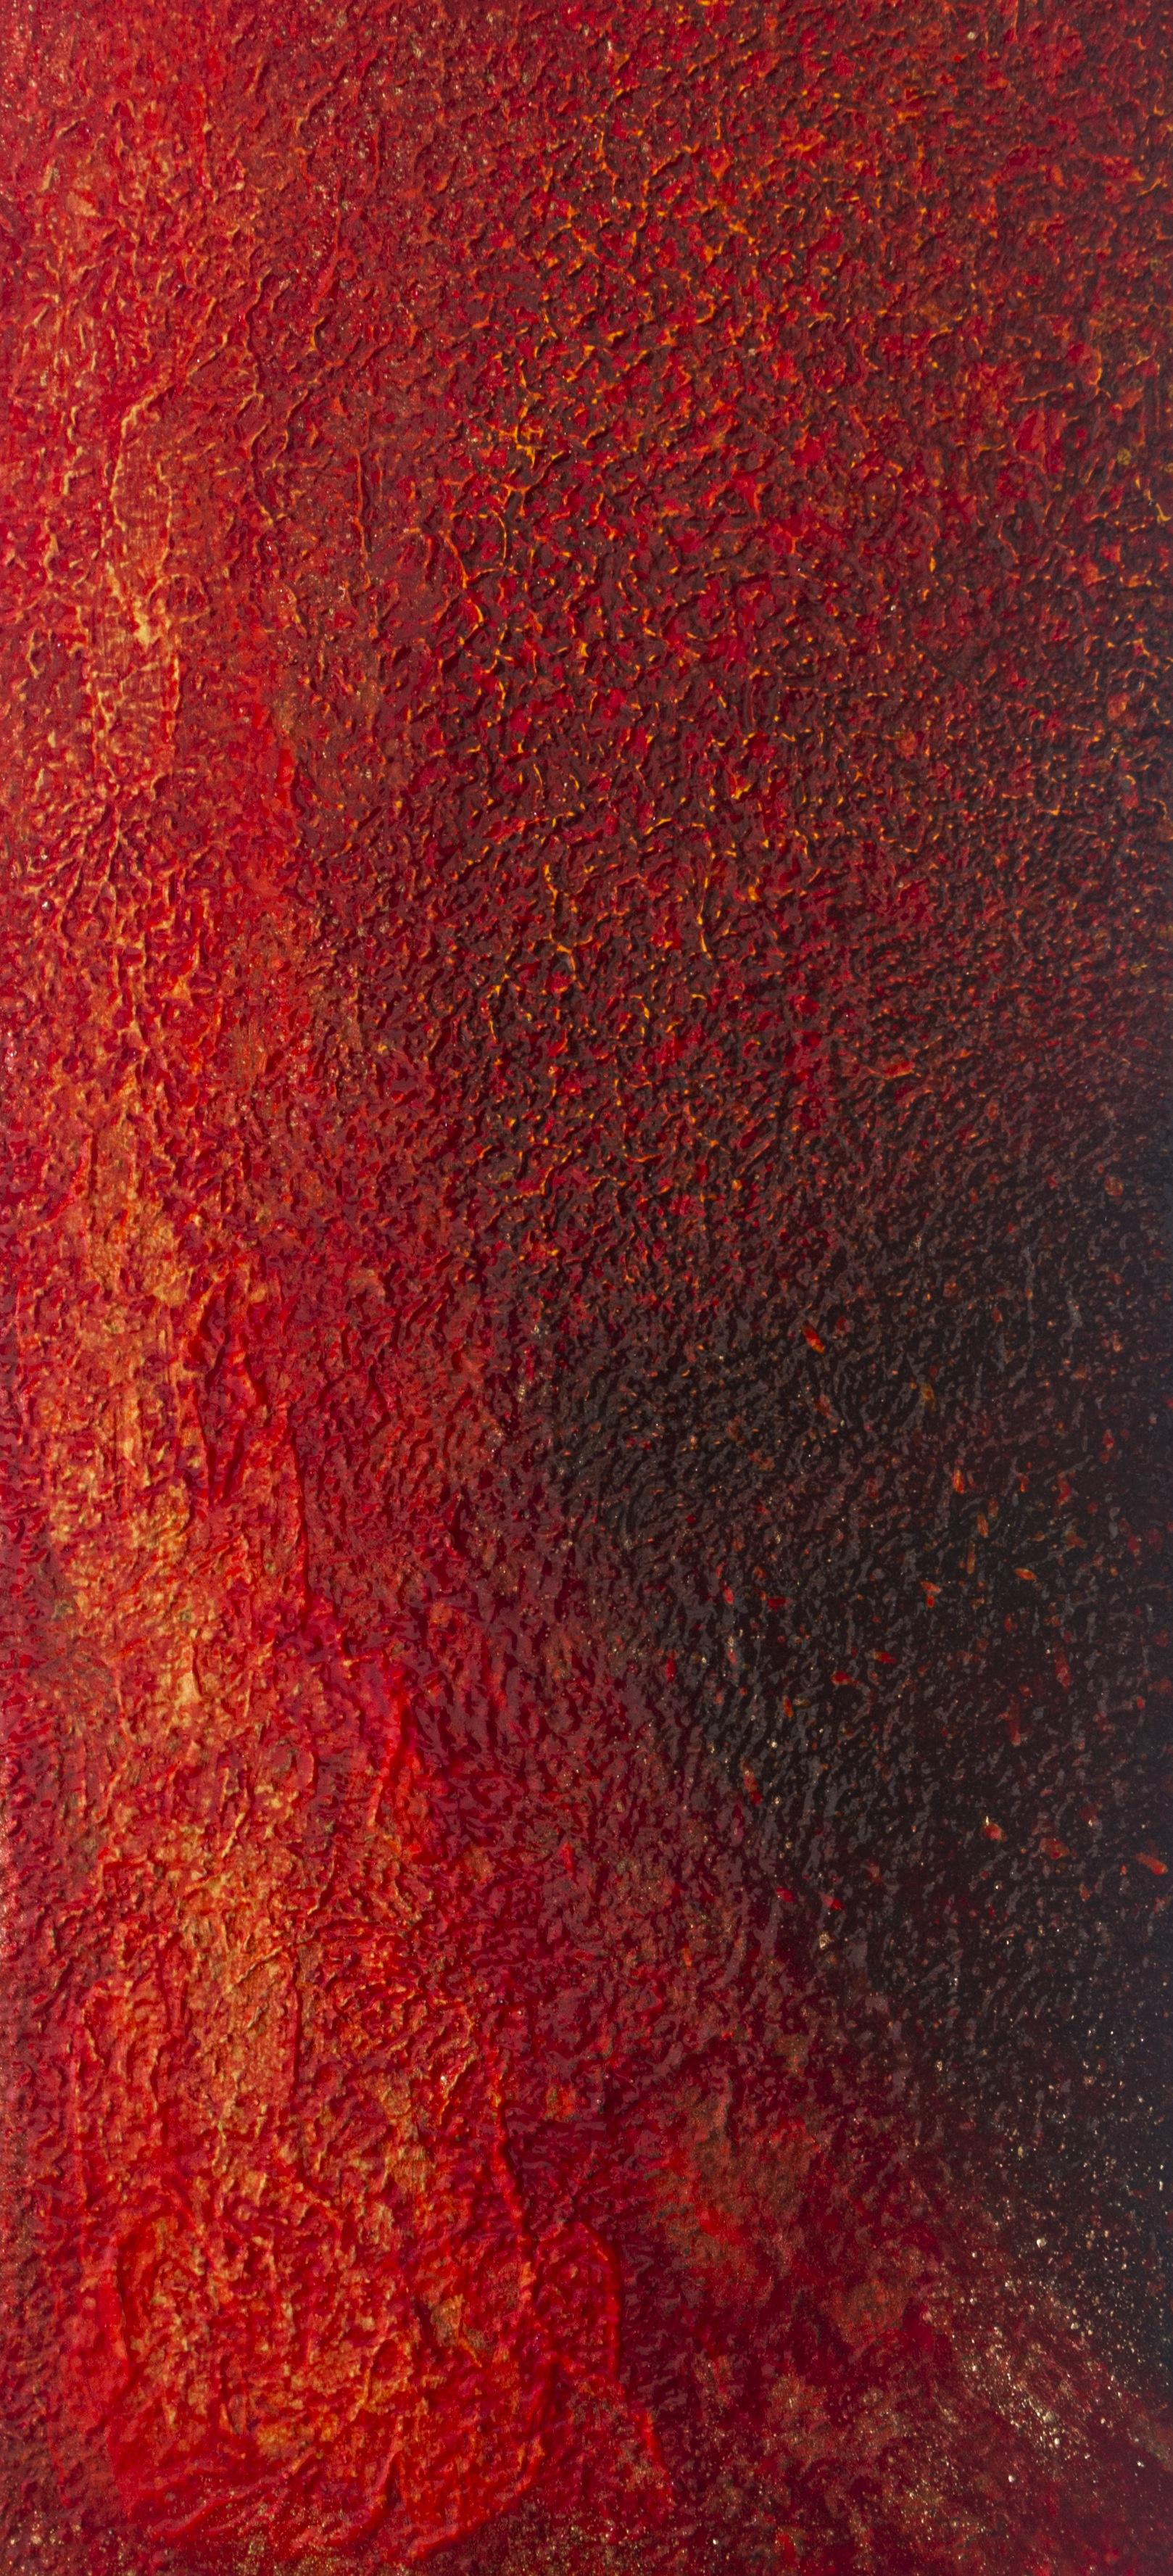 Ольга Акаси. Dark Red